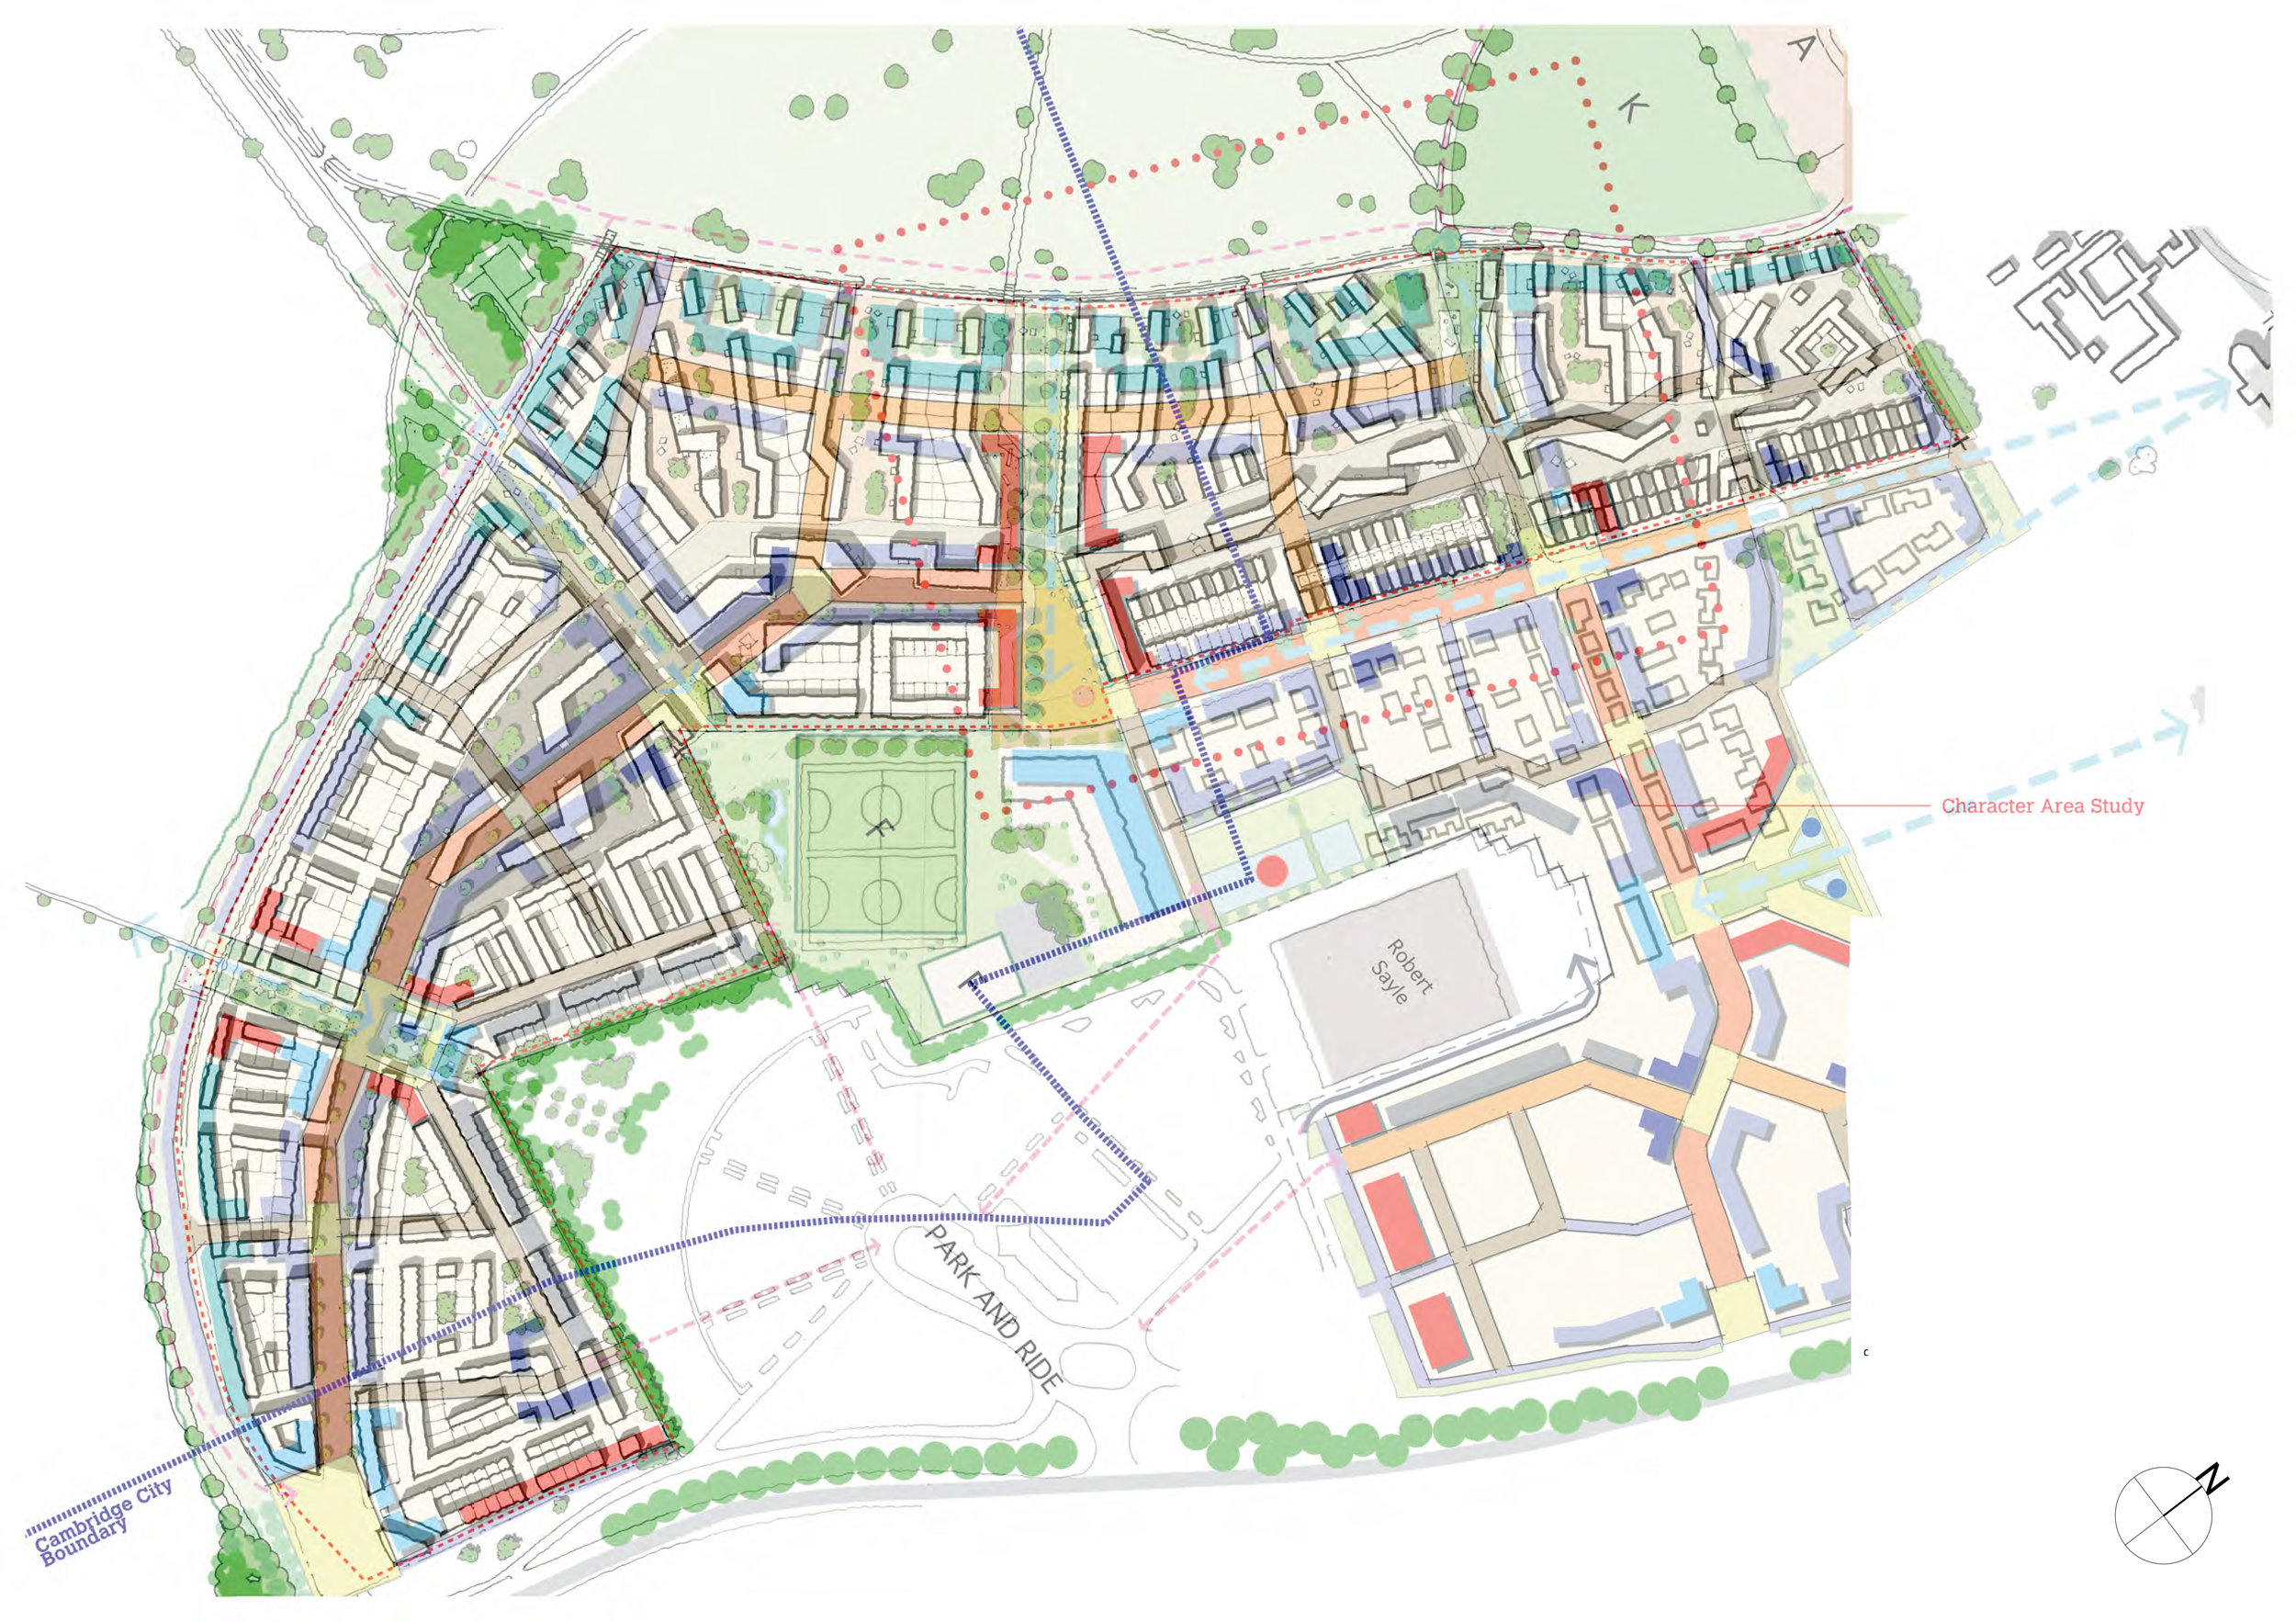 Overlay analysis with Cambridge City Parameter Plan